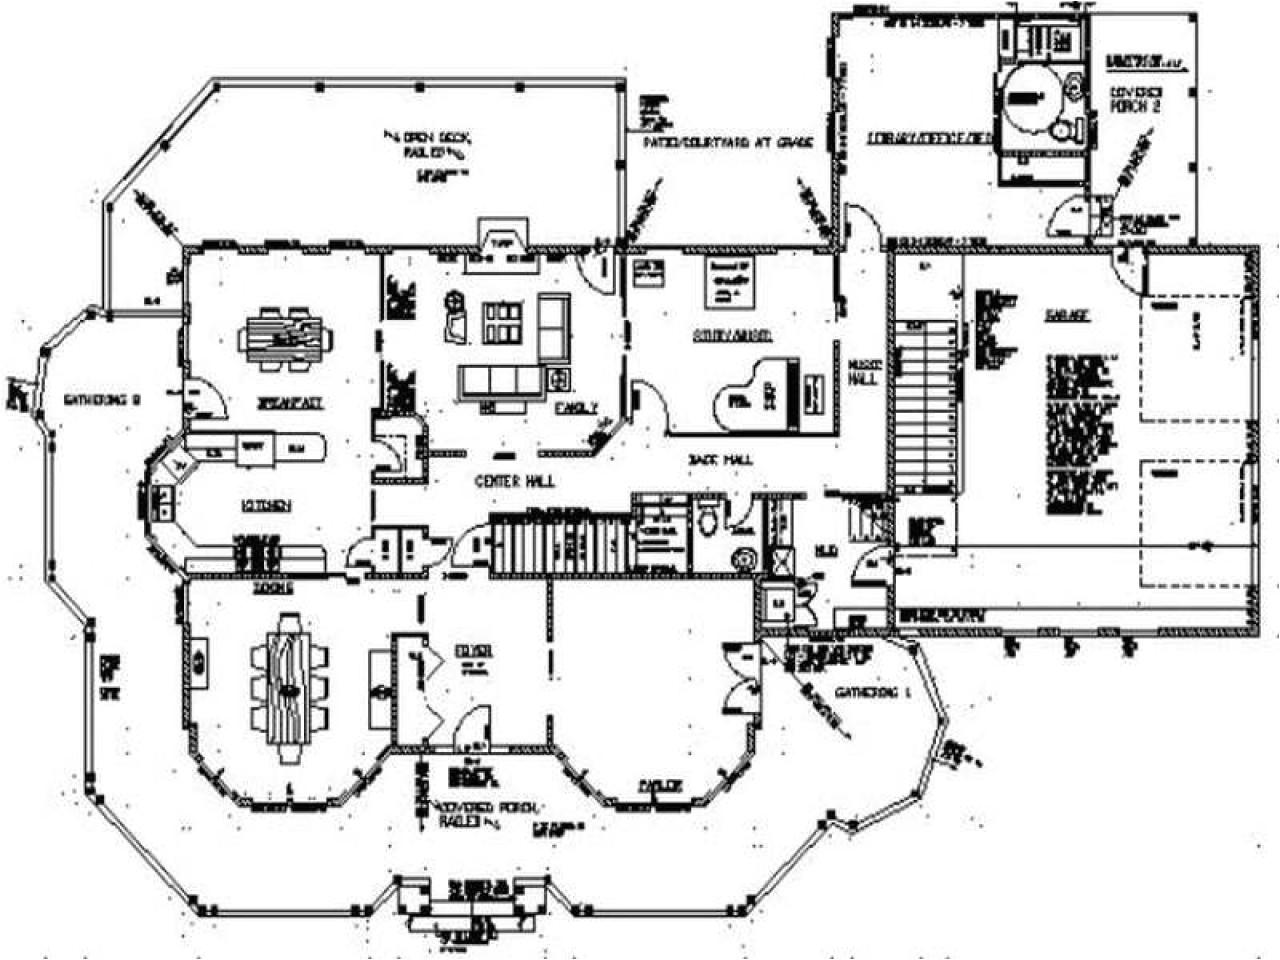 570b22ada5d6f047 victorian vintage house floor plans victorian house floor plans